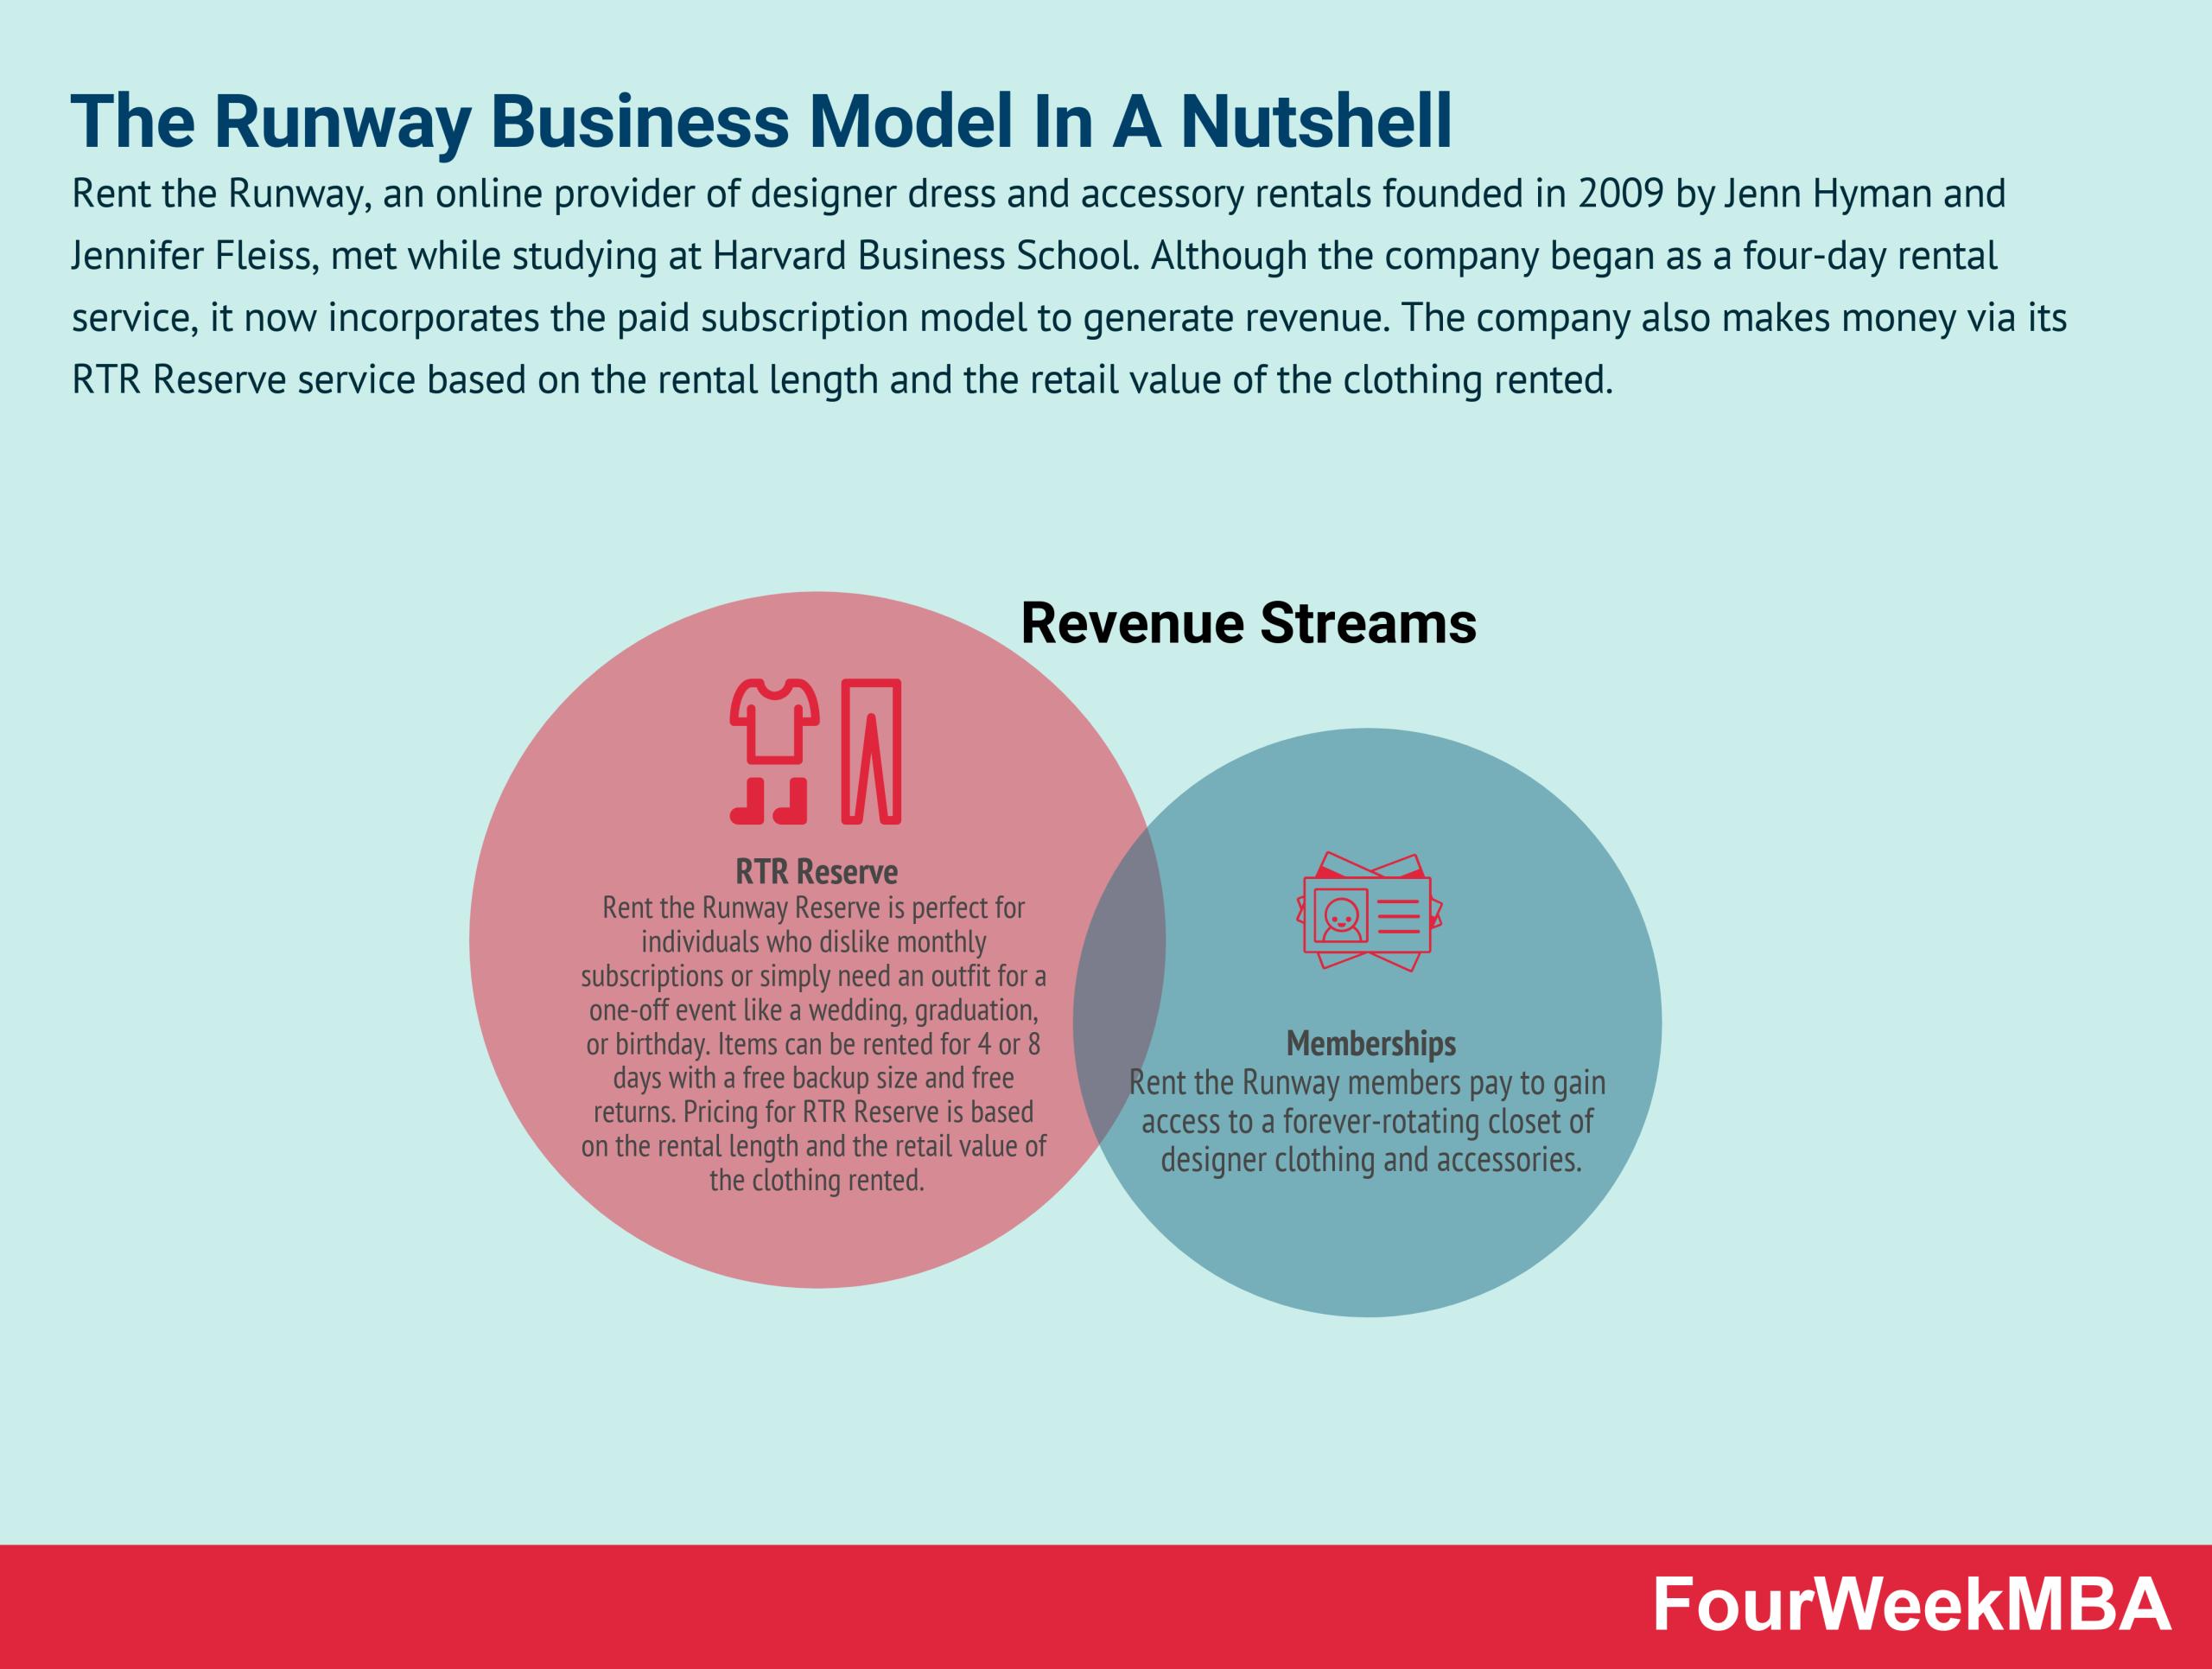 rent-the-runway-business-model